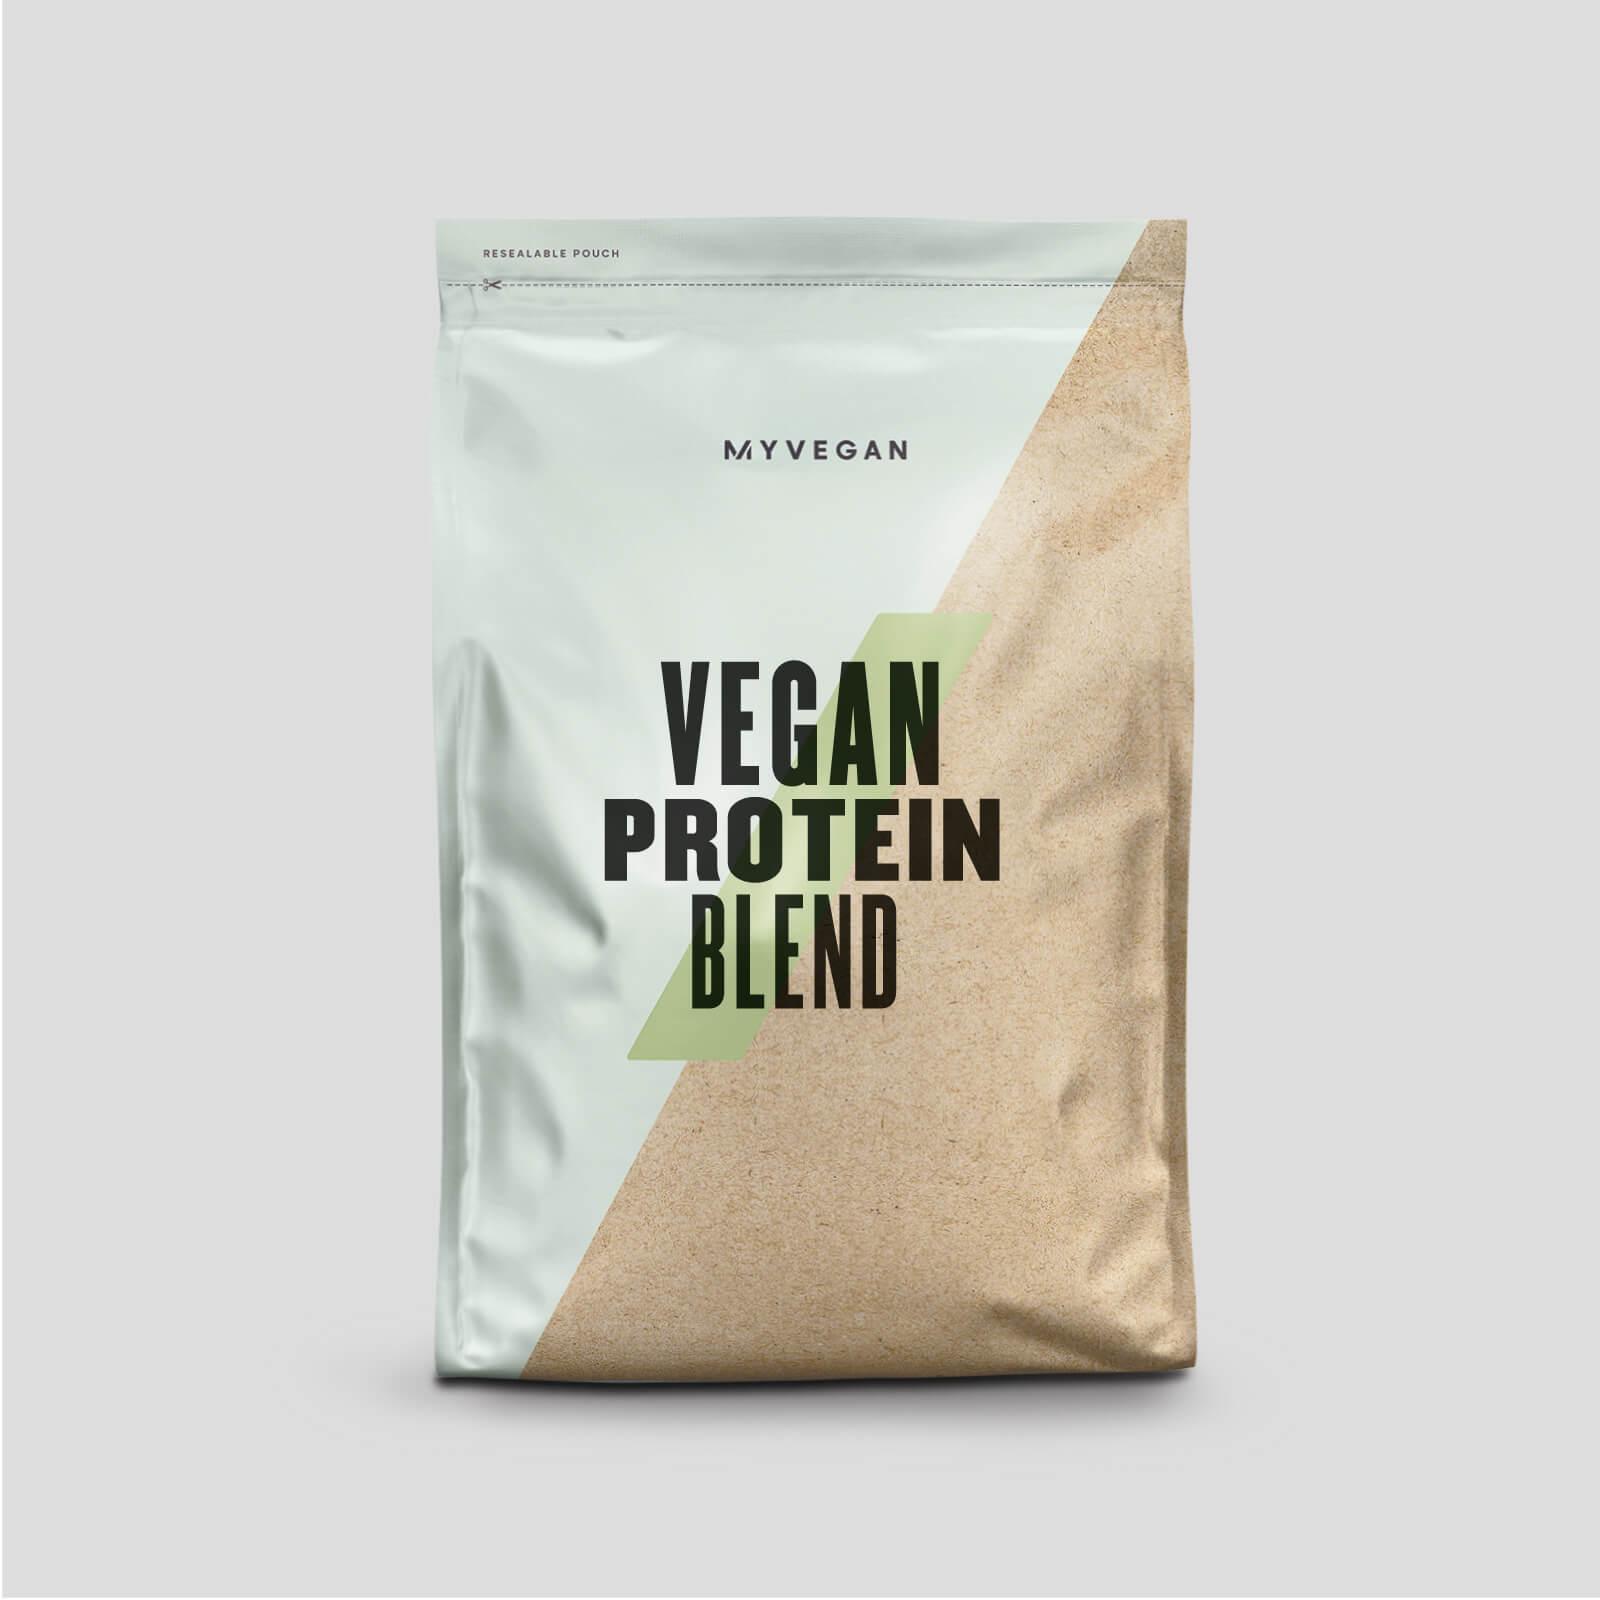 Myvegan Miscela Proteica Vegana - 500g - Latte e curcuma